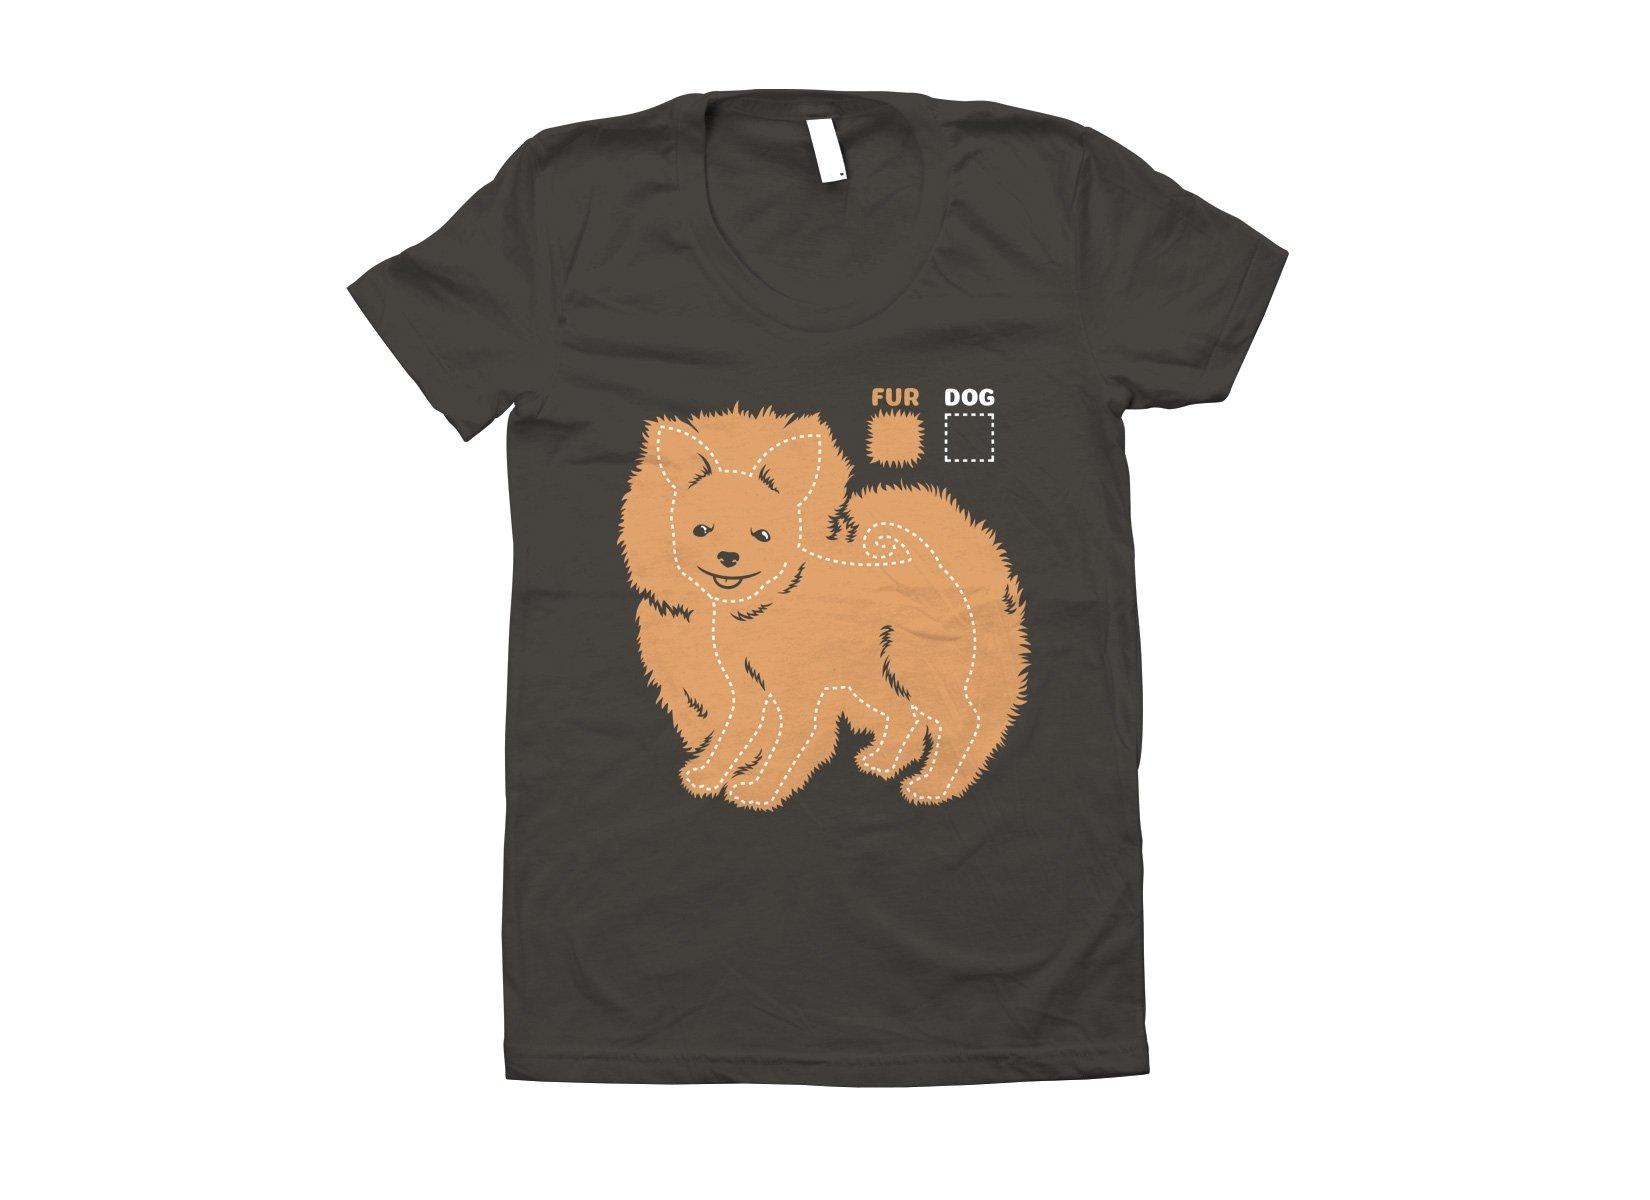 Dog vs Fur Pomeranian on Juniors T-Shirt